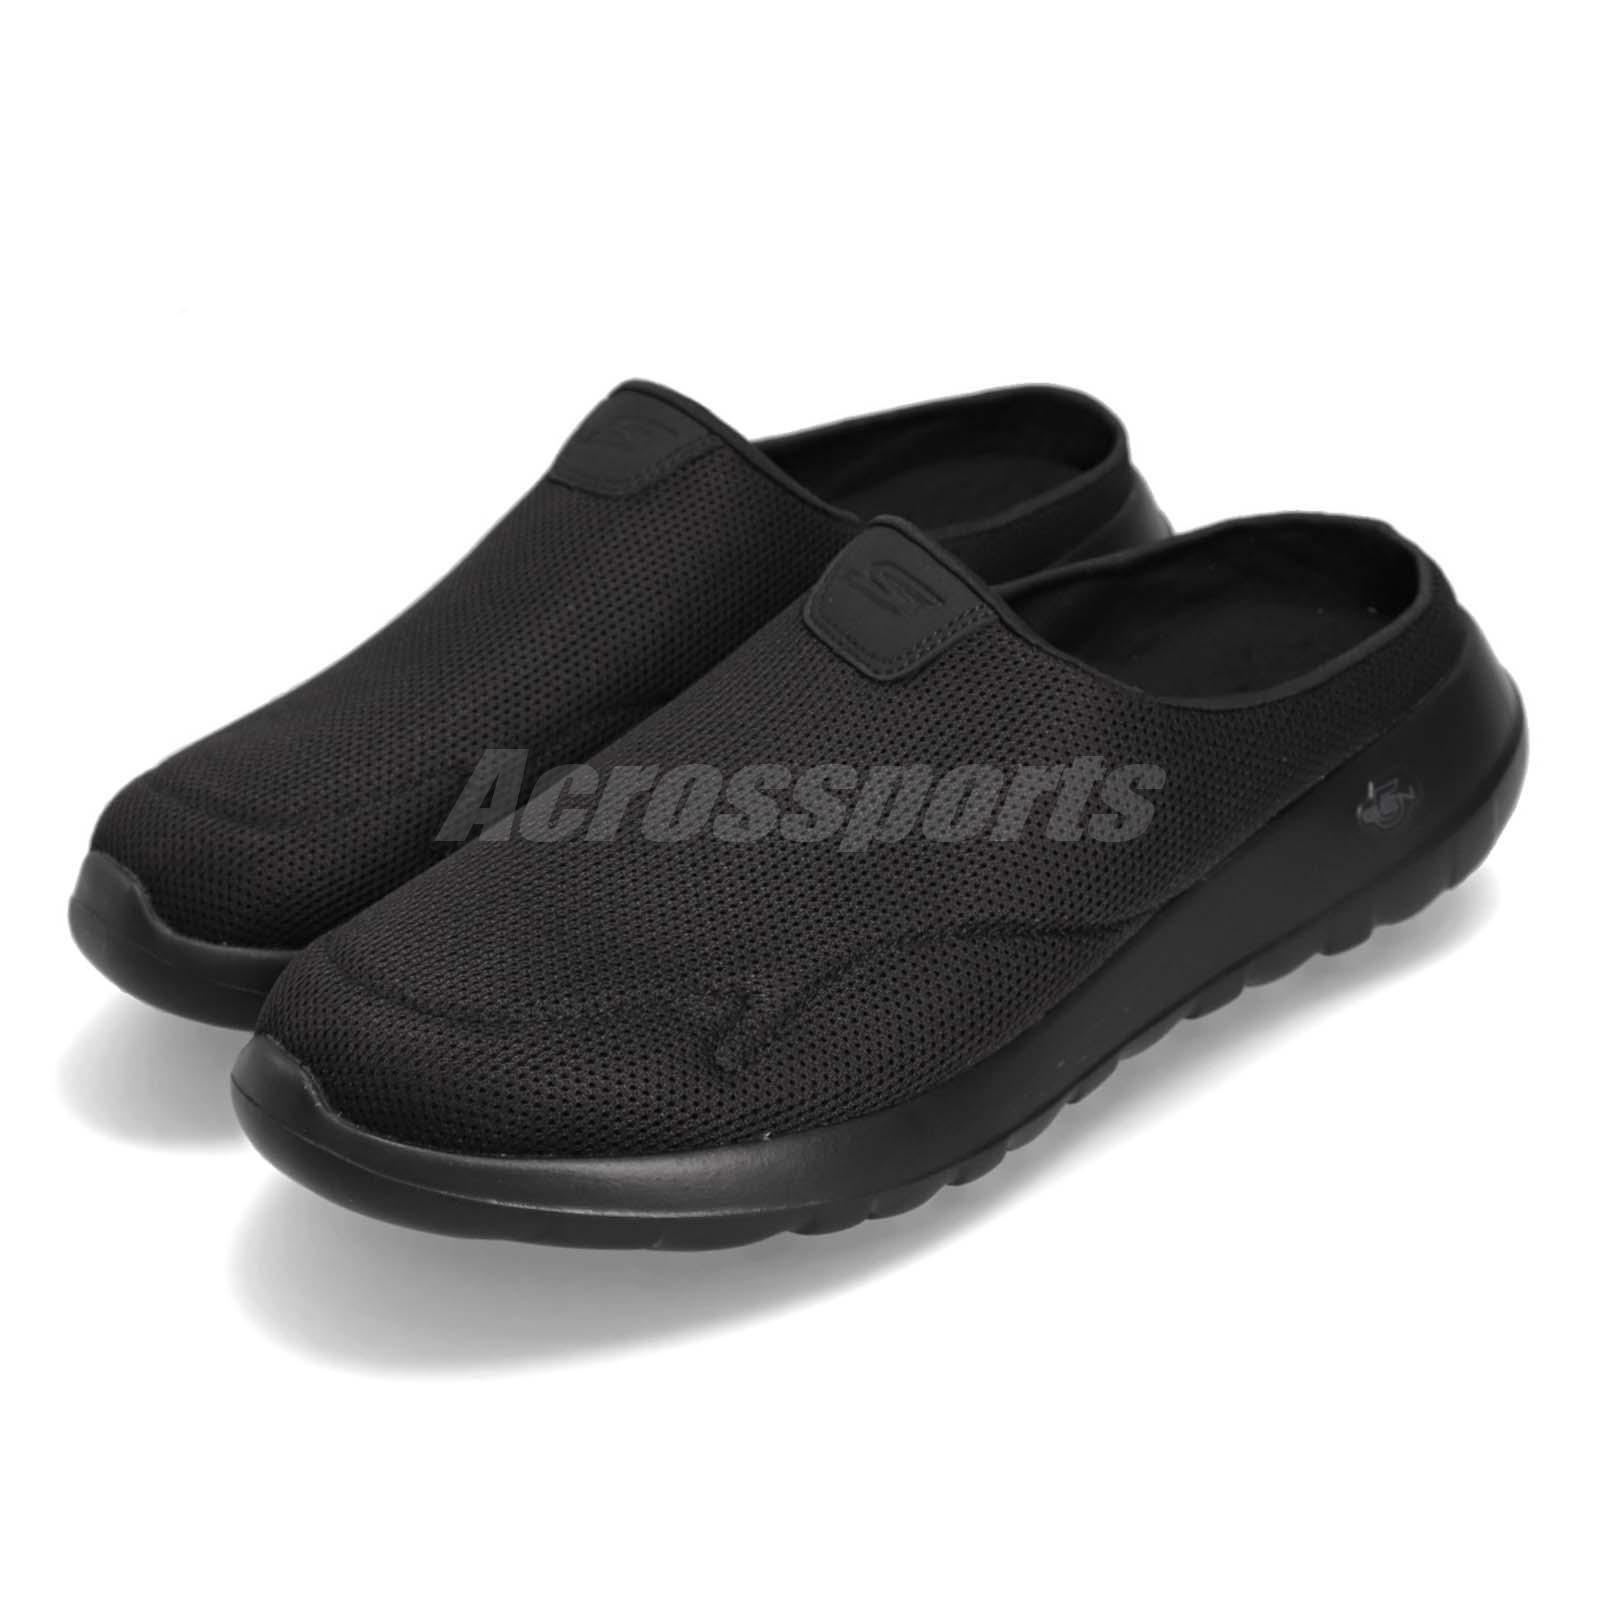 638ac5dff Details about Skechers Go Walk Max-Talent Black Men Sandals Slip On Walking  Shoes 54636-BBK